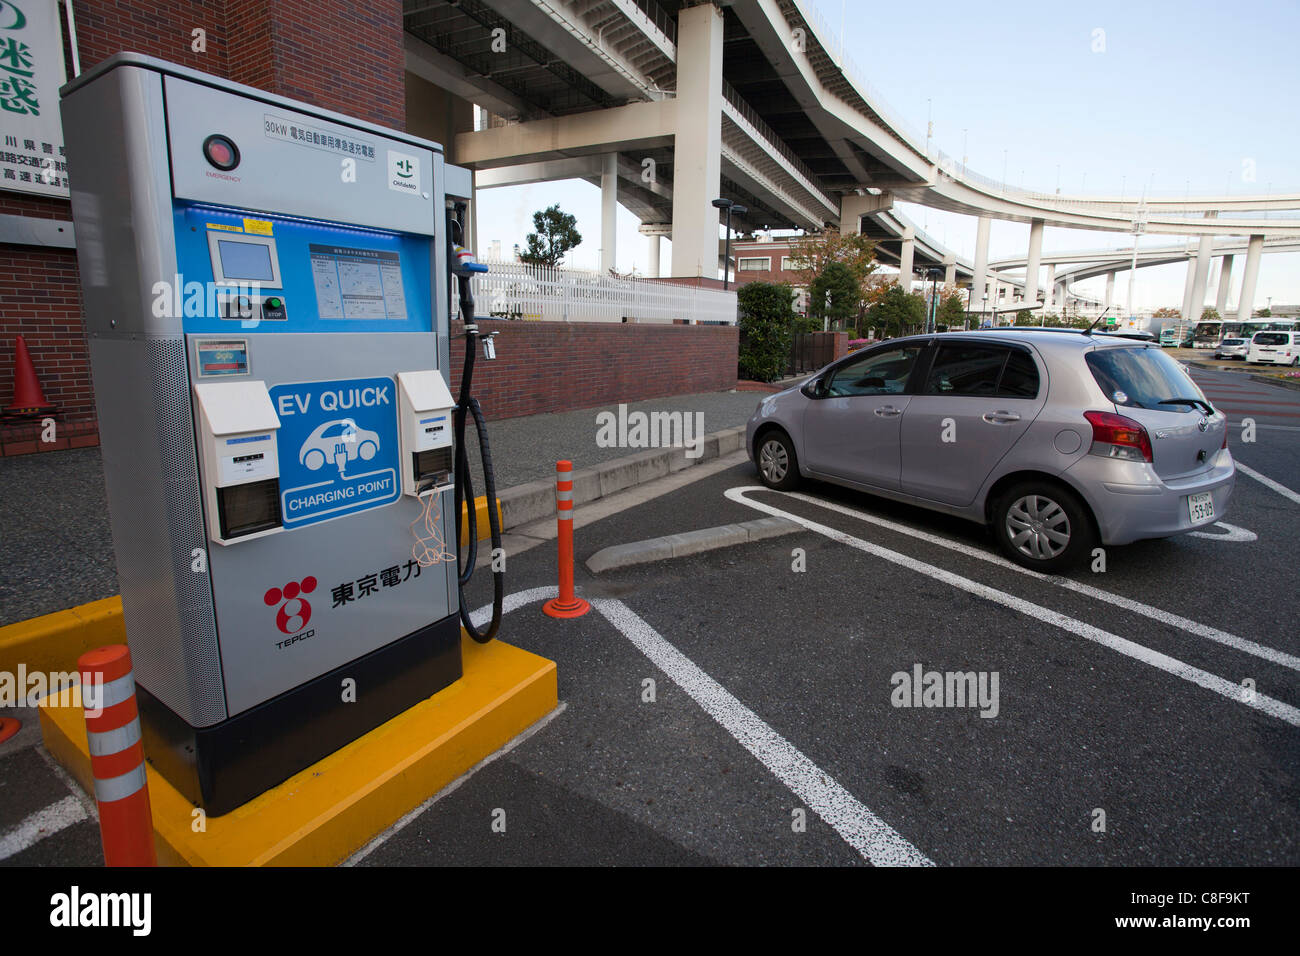 Yokohama, Stadt, Tankstelle, Auto, Automobil, Strom, Elektro-Auto, Auto, tanken, Energie, Umwelt, Japan, Novemb Stockbild